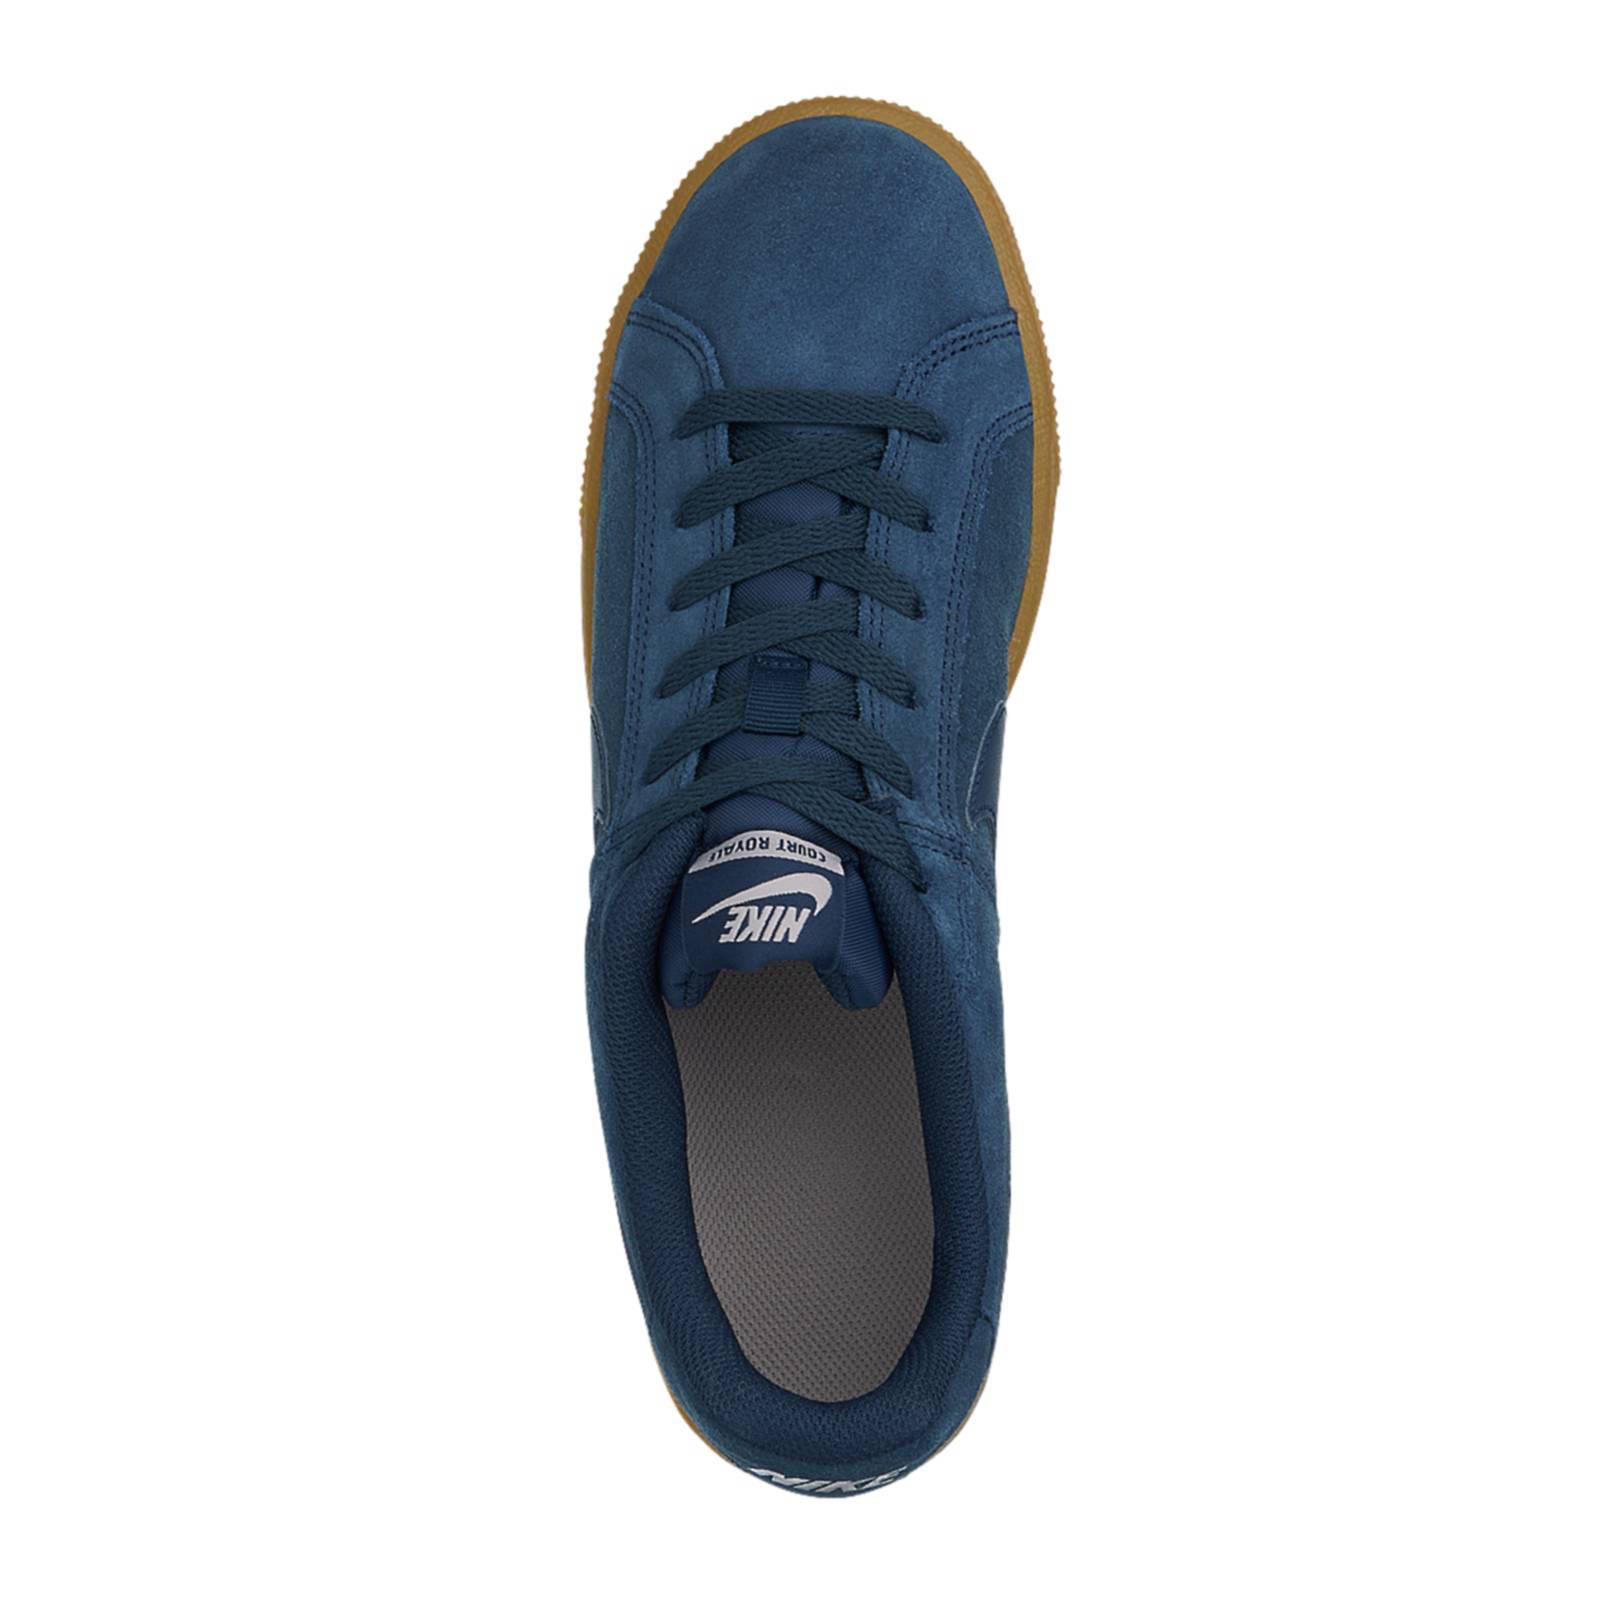 Court Royal suède sneakers